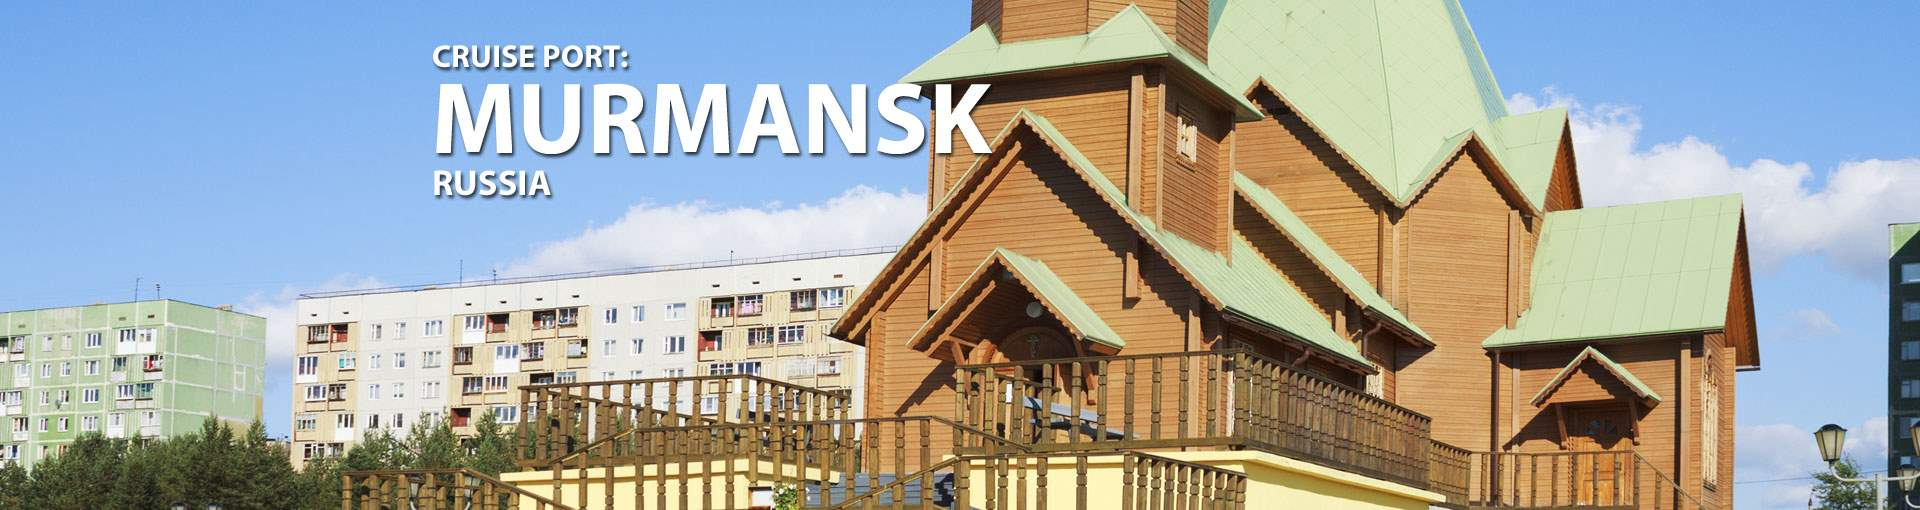 Cruises to Murmansk, Russia